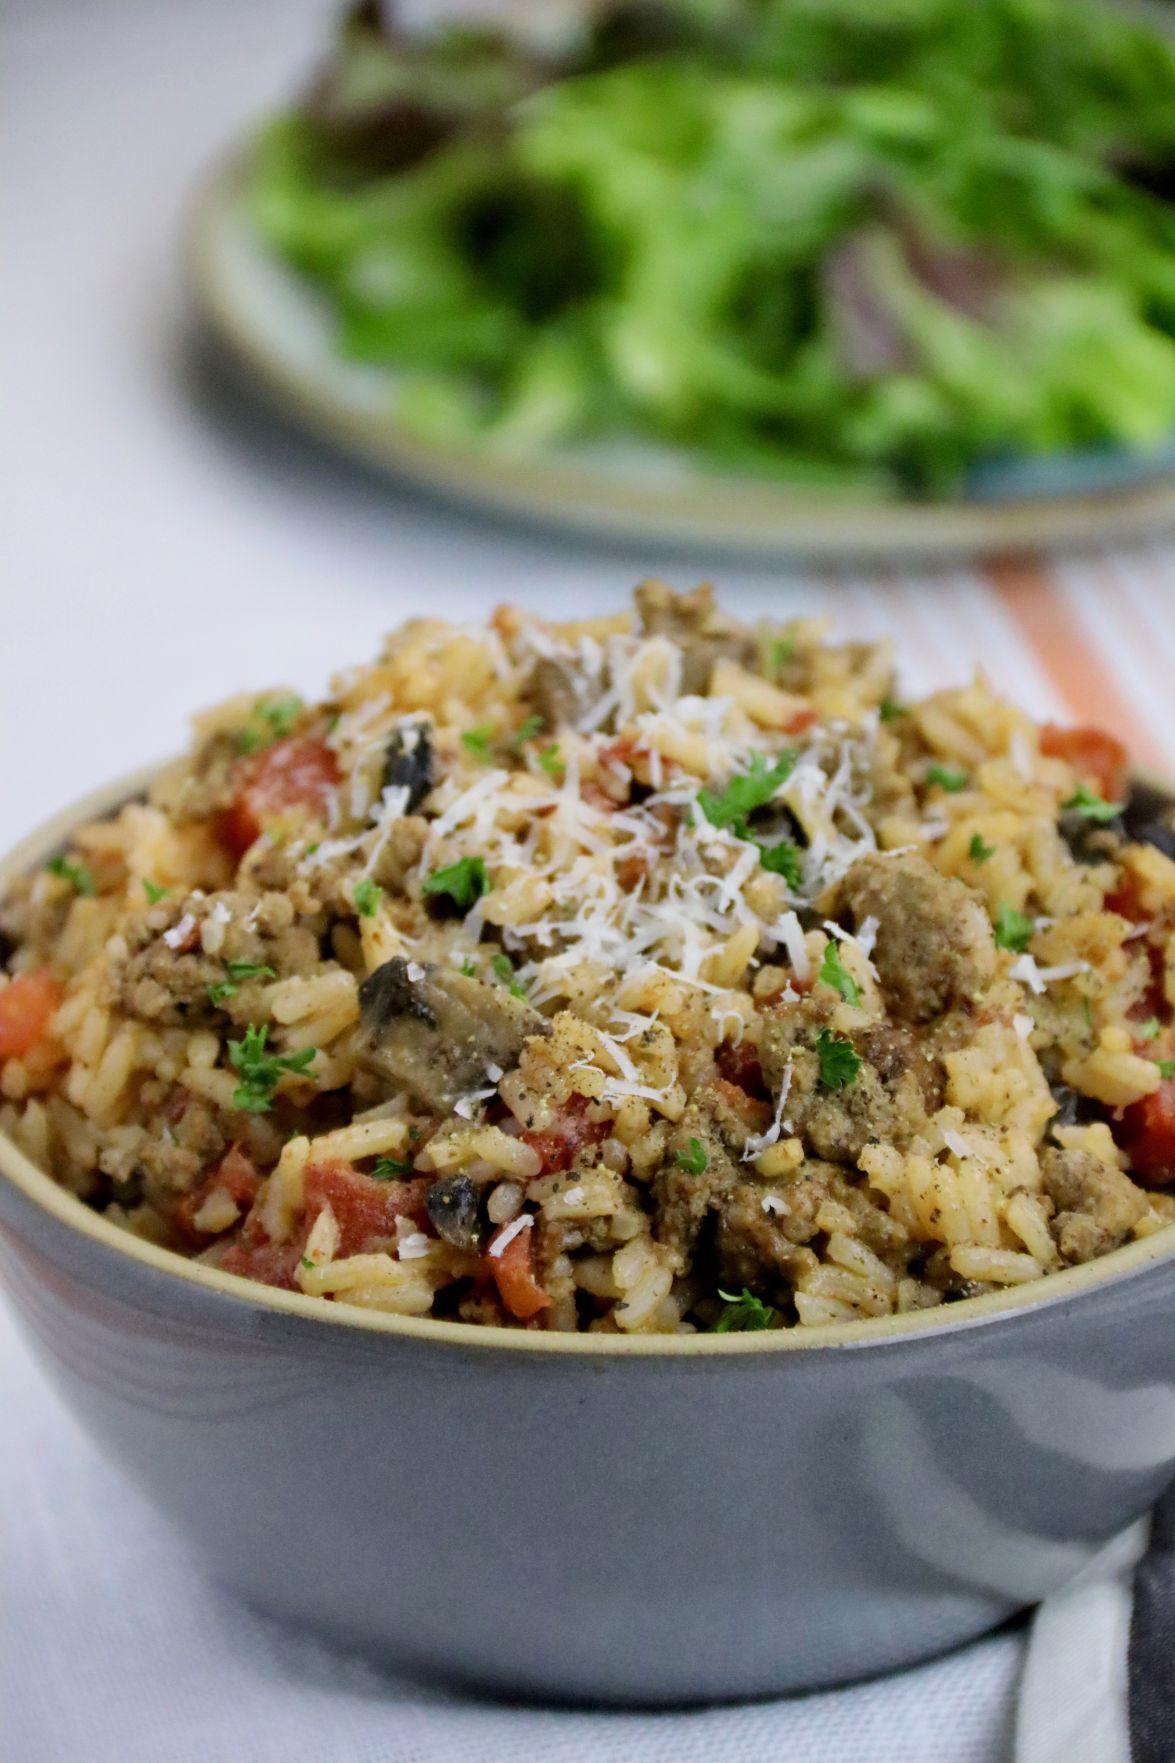 Easy Ground Beef, Mushroom and Rice Dinner